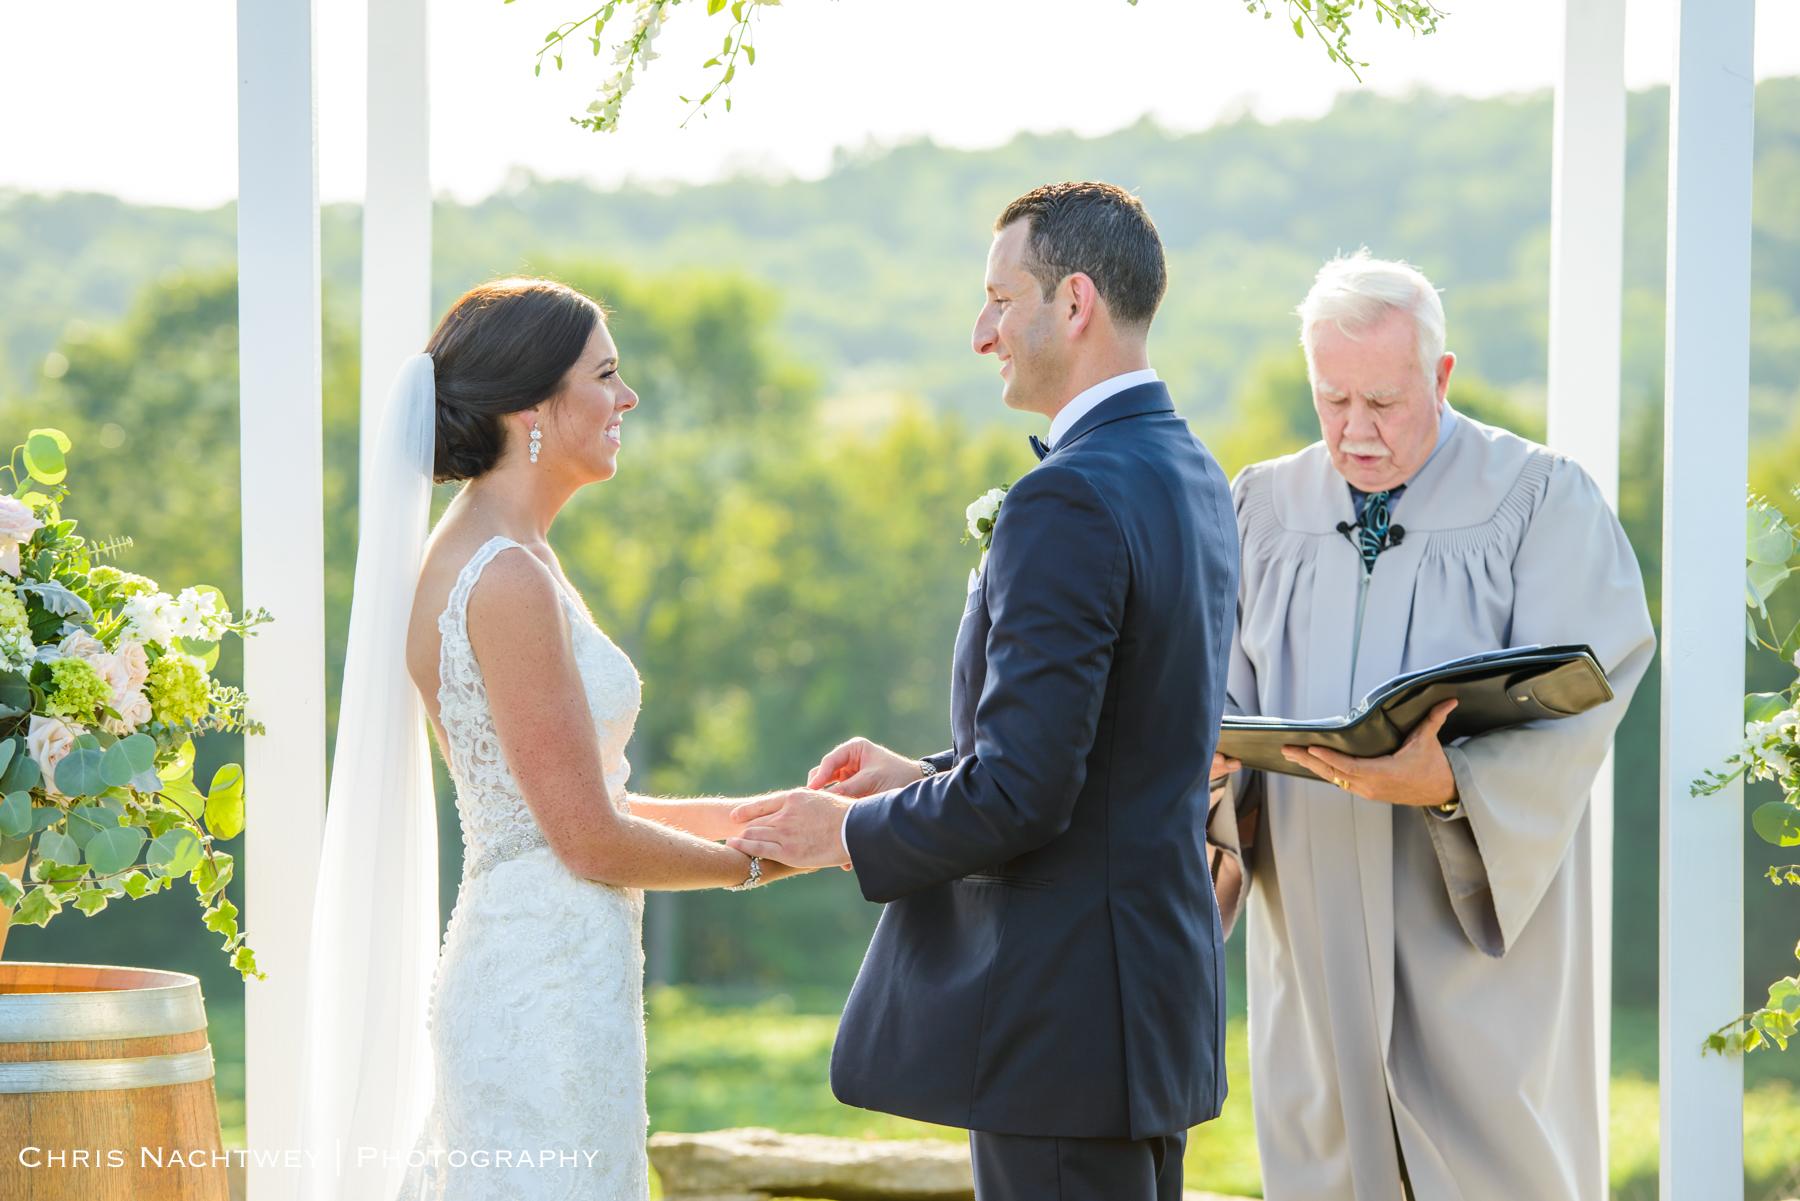 wedding-lake-of-isles-photos-chris-nachtwey-photography-2019-33.jpg